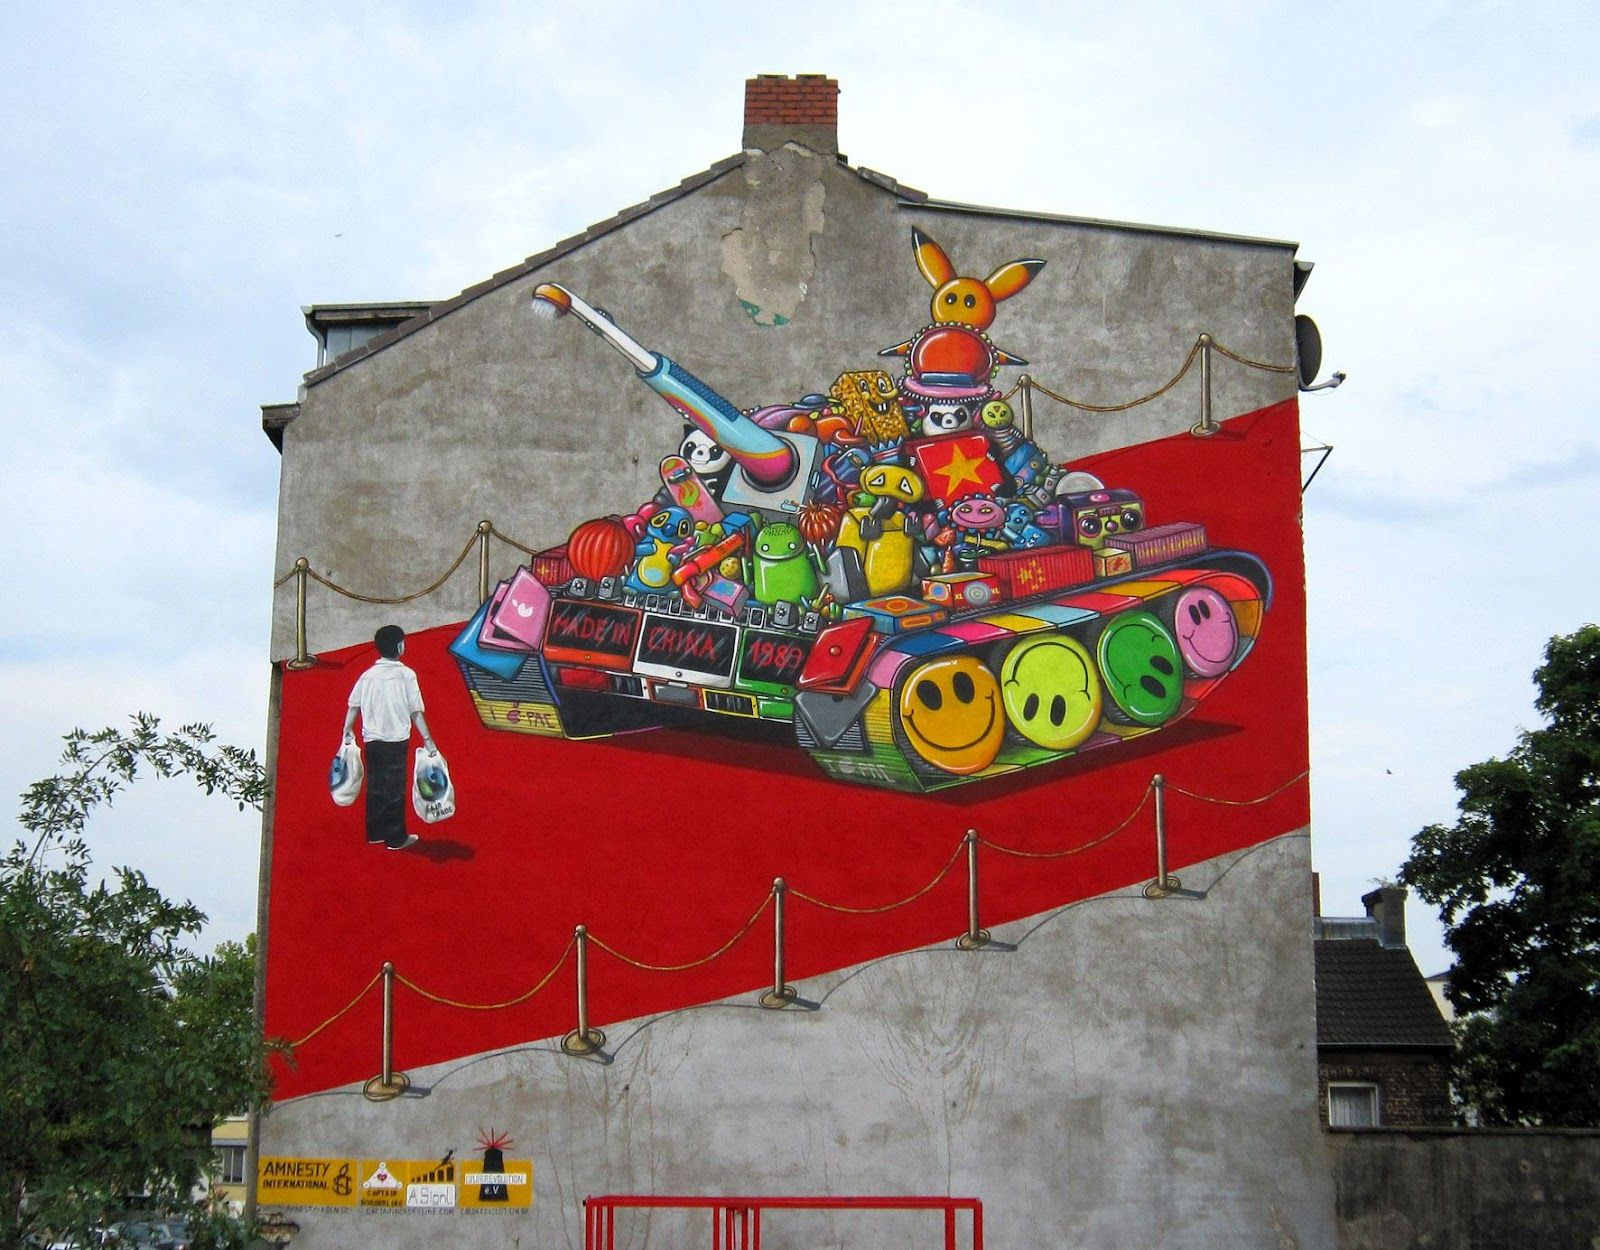 A.Signl New Mural In Cologne, Germany. Street Art - Graffiti - Urban culture.